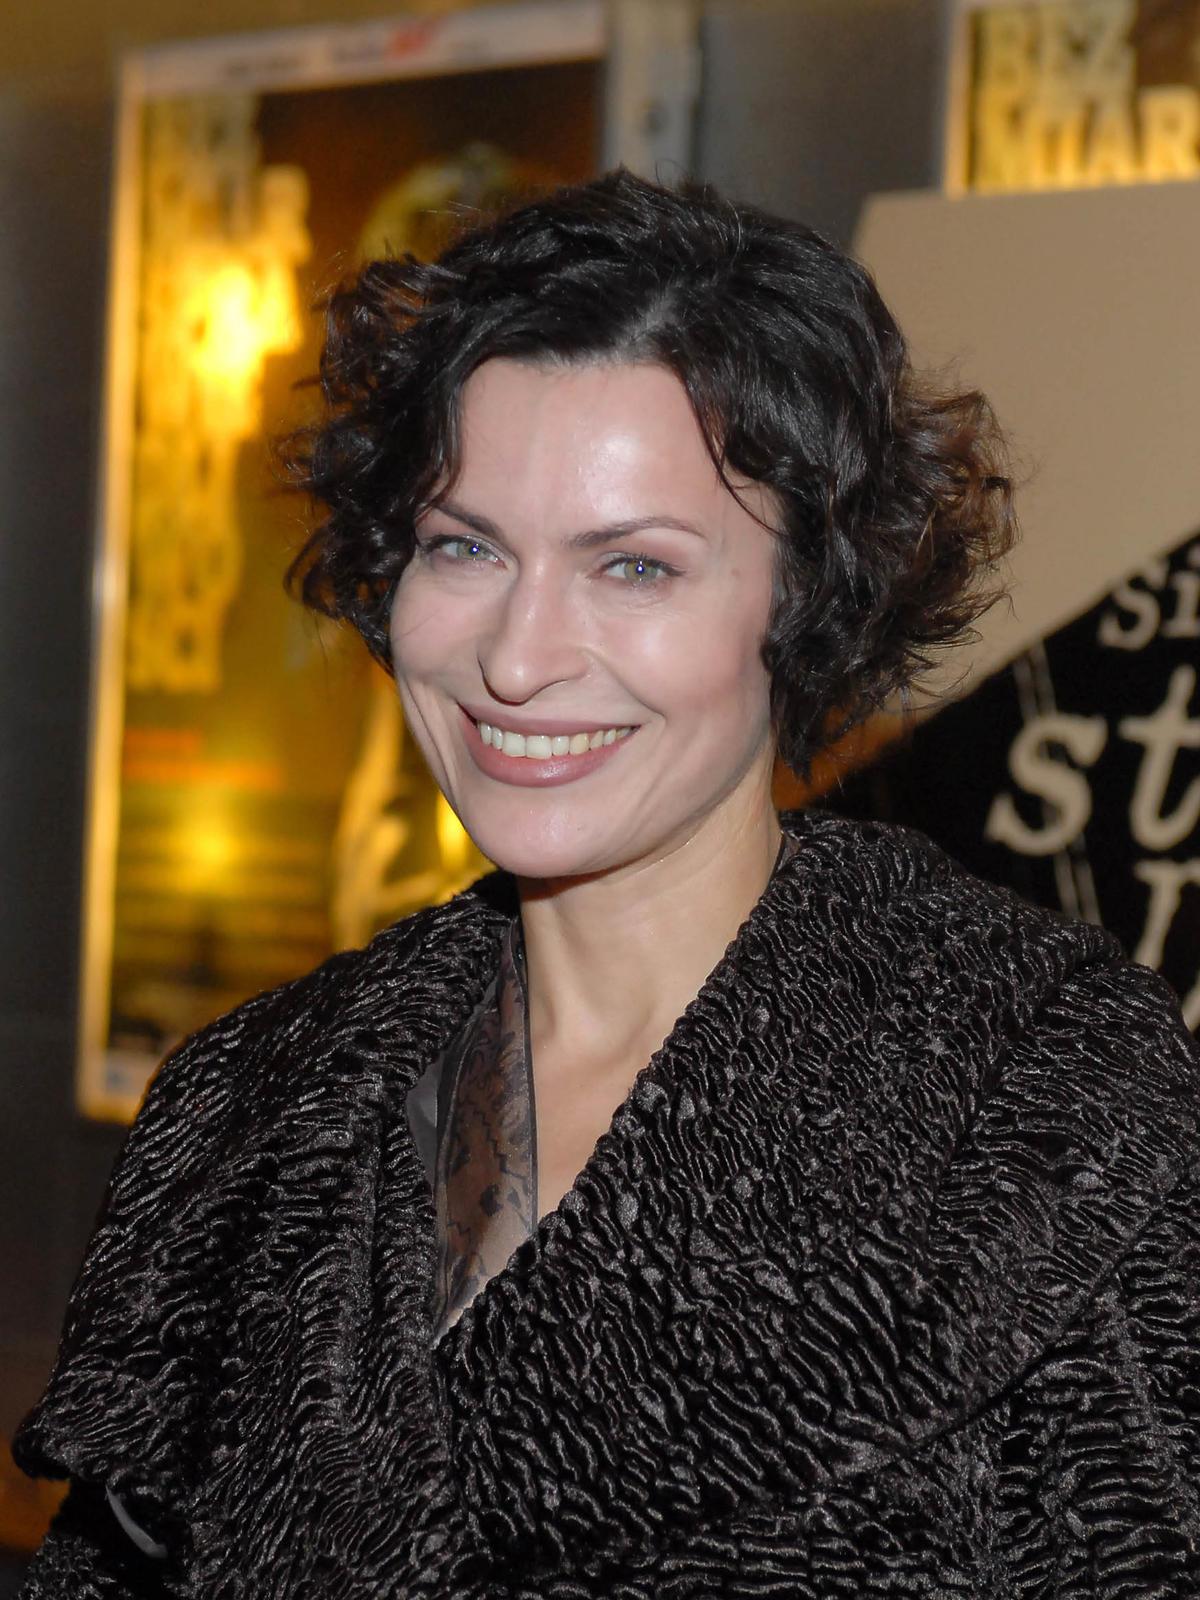 Danuta Stenka w 2007 roku